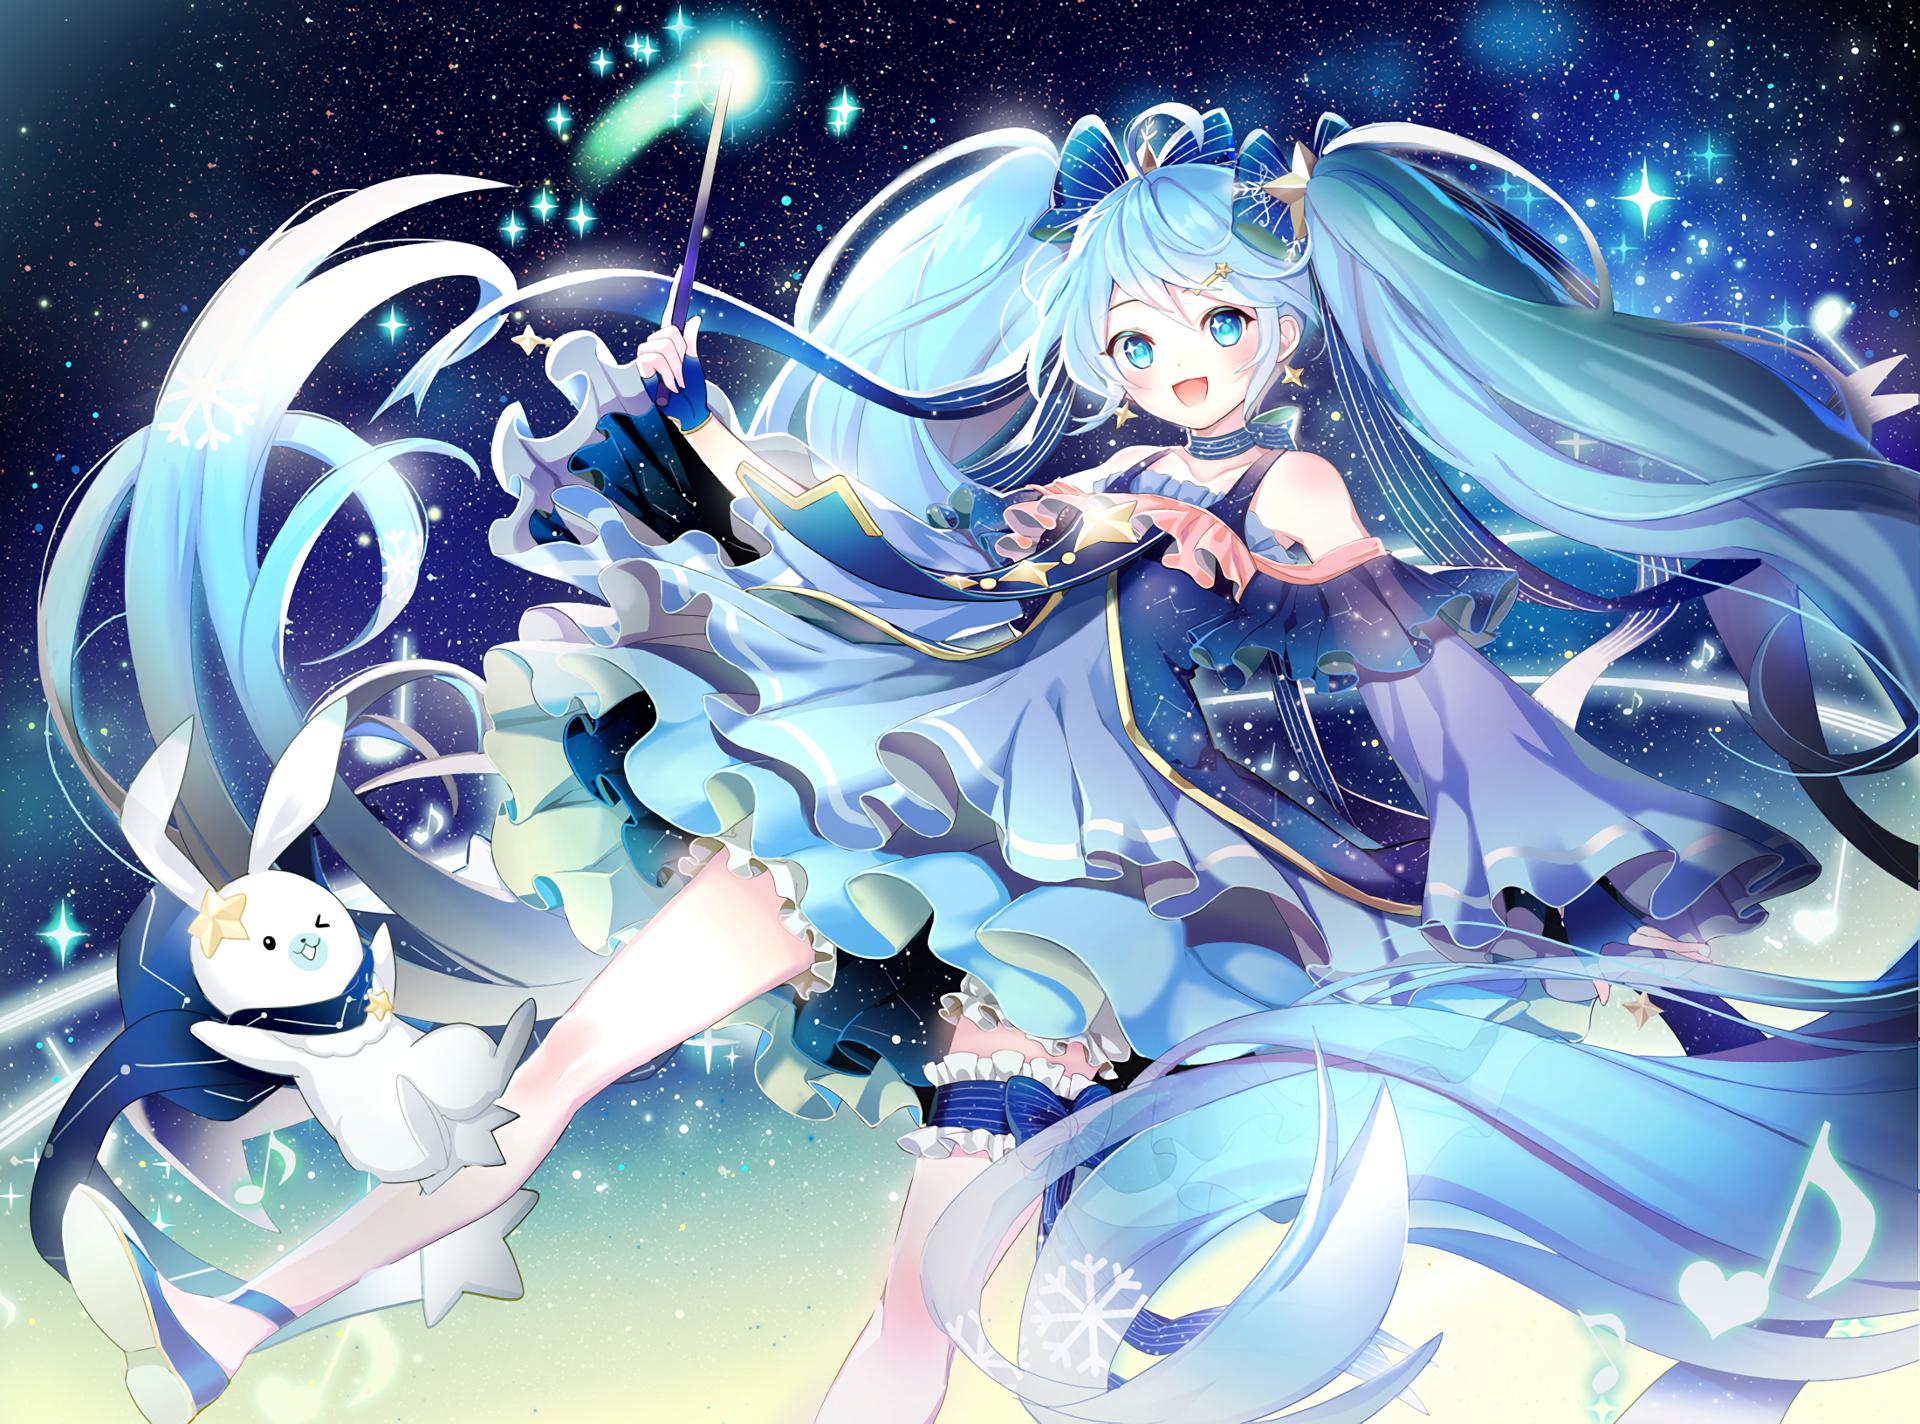 Vocaloid hd wallpaper background image 1920x1424 id - Best anime wallpaper 2016 ...